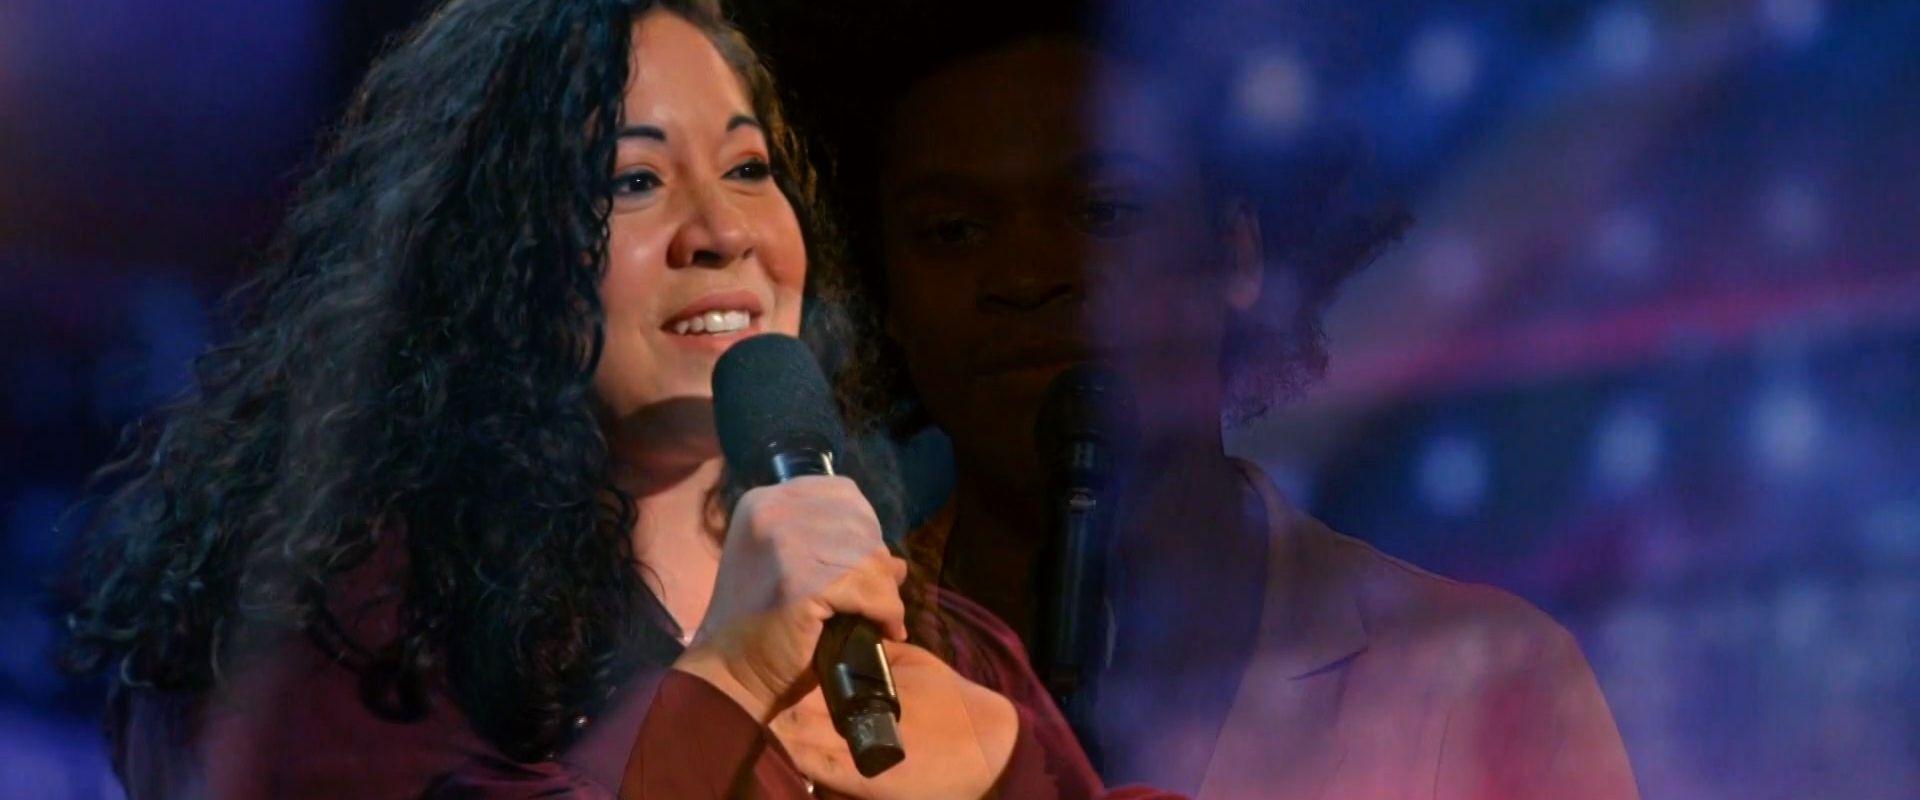 America's Got Talent, Season 16, Episode 20